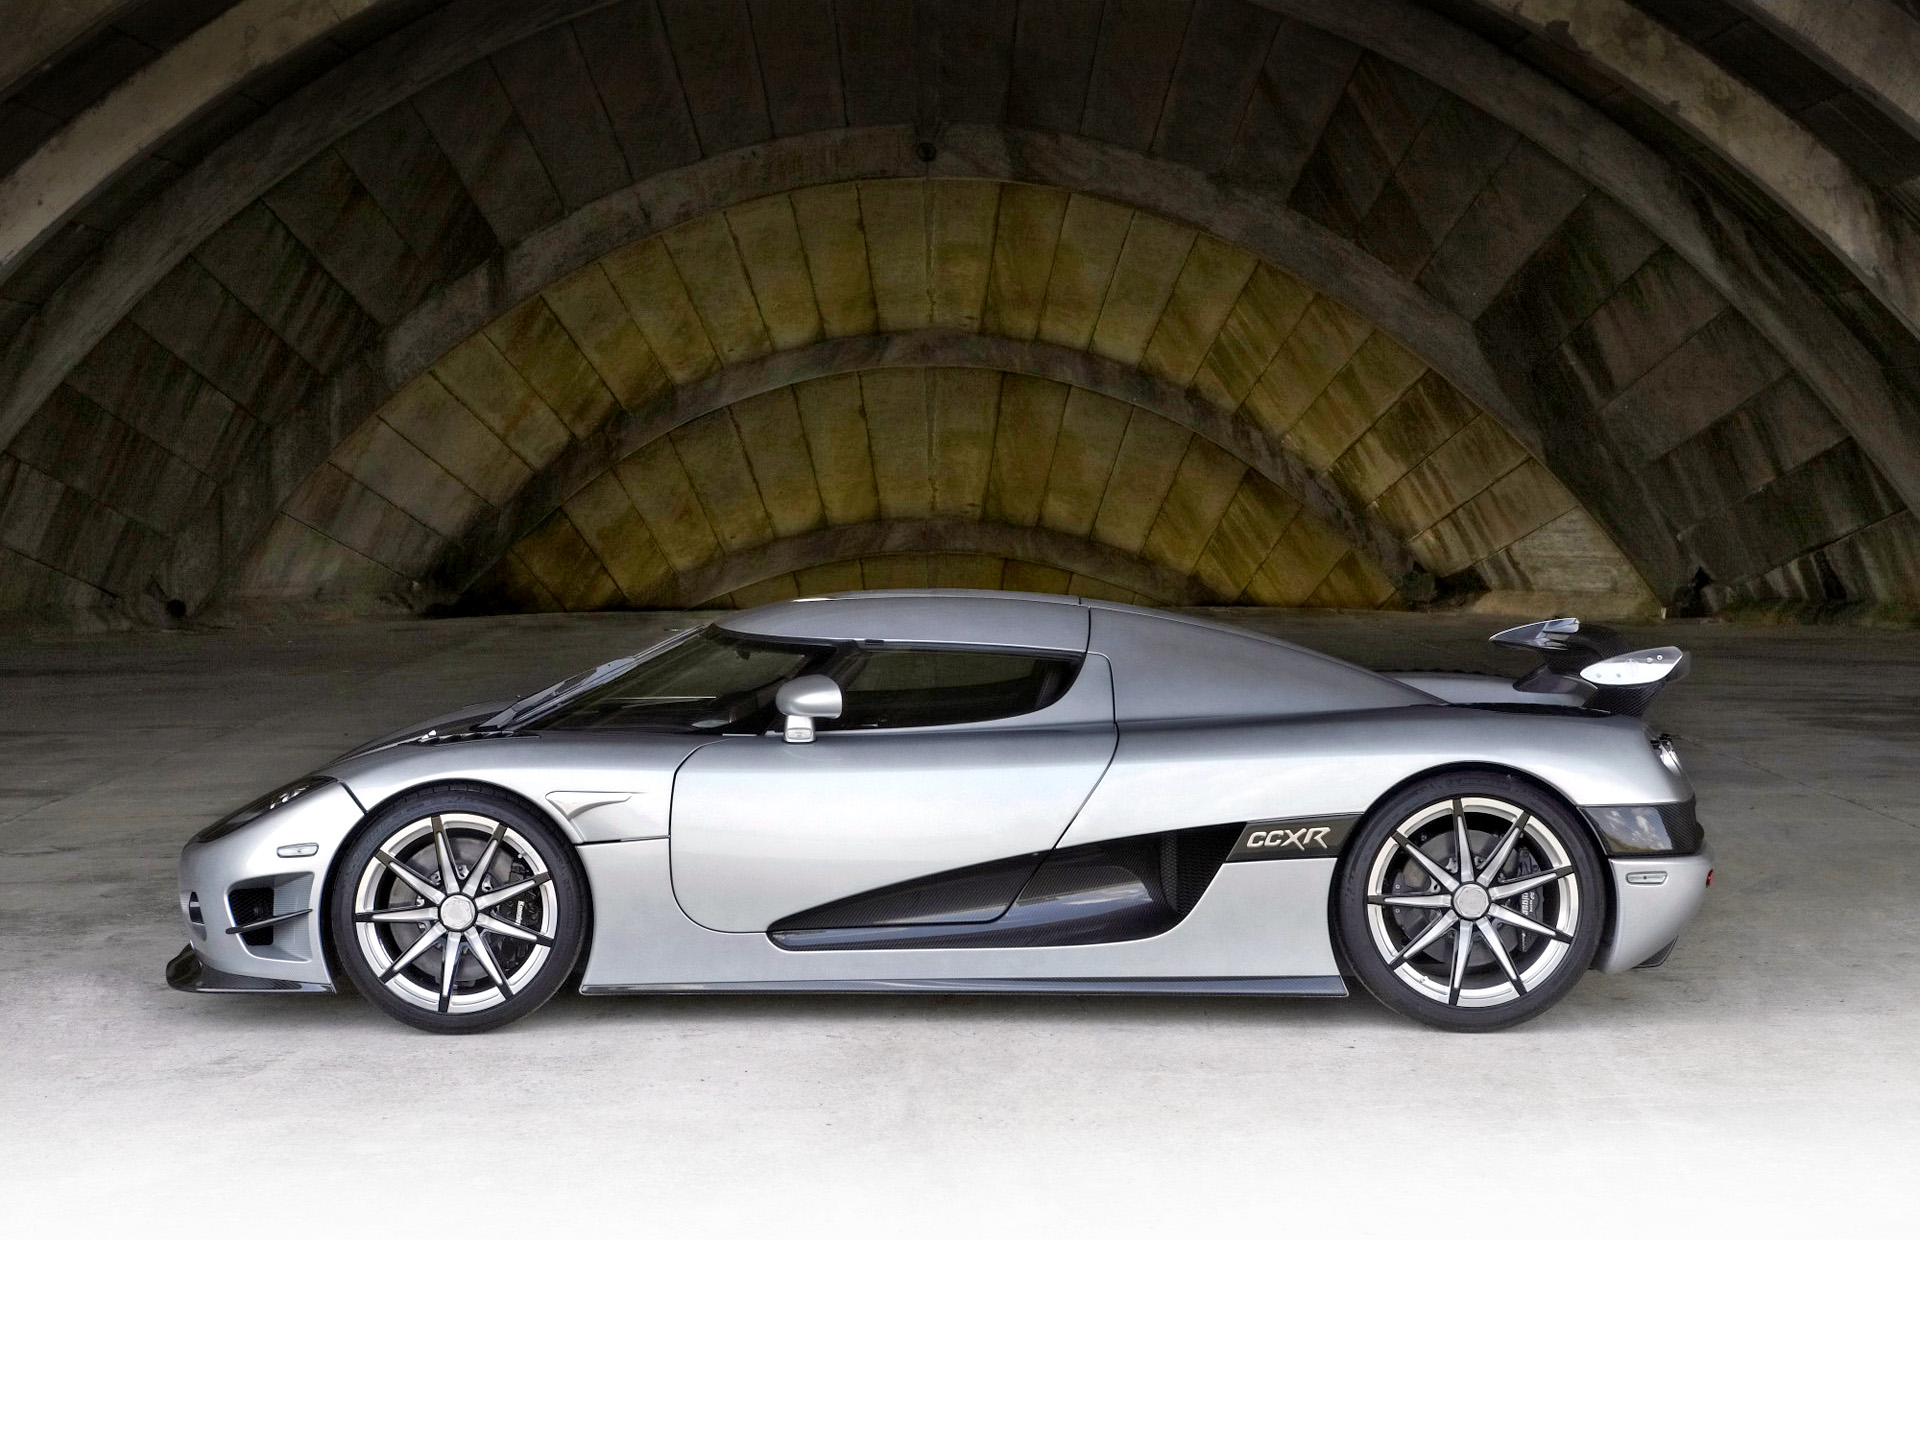 Koenigsegg Ccxr Trevita >> Diamond On Wheels Koenigsegg Ccxr Trevita The Lowdown